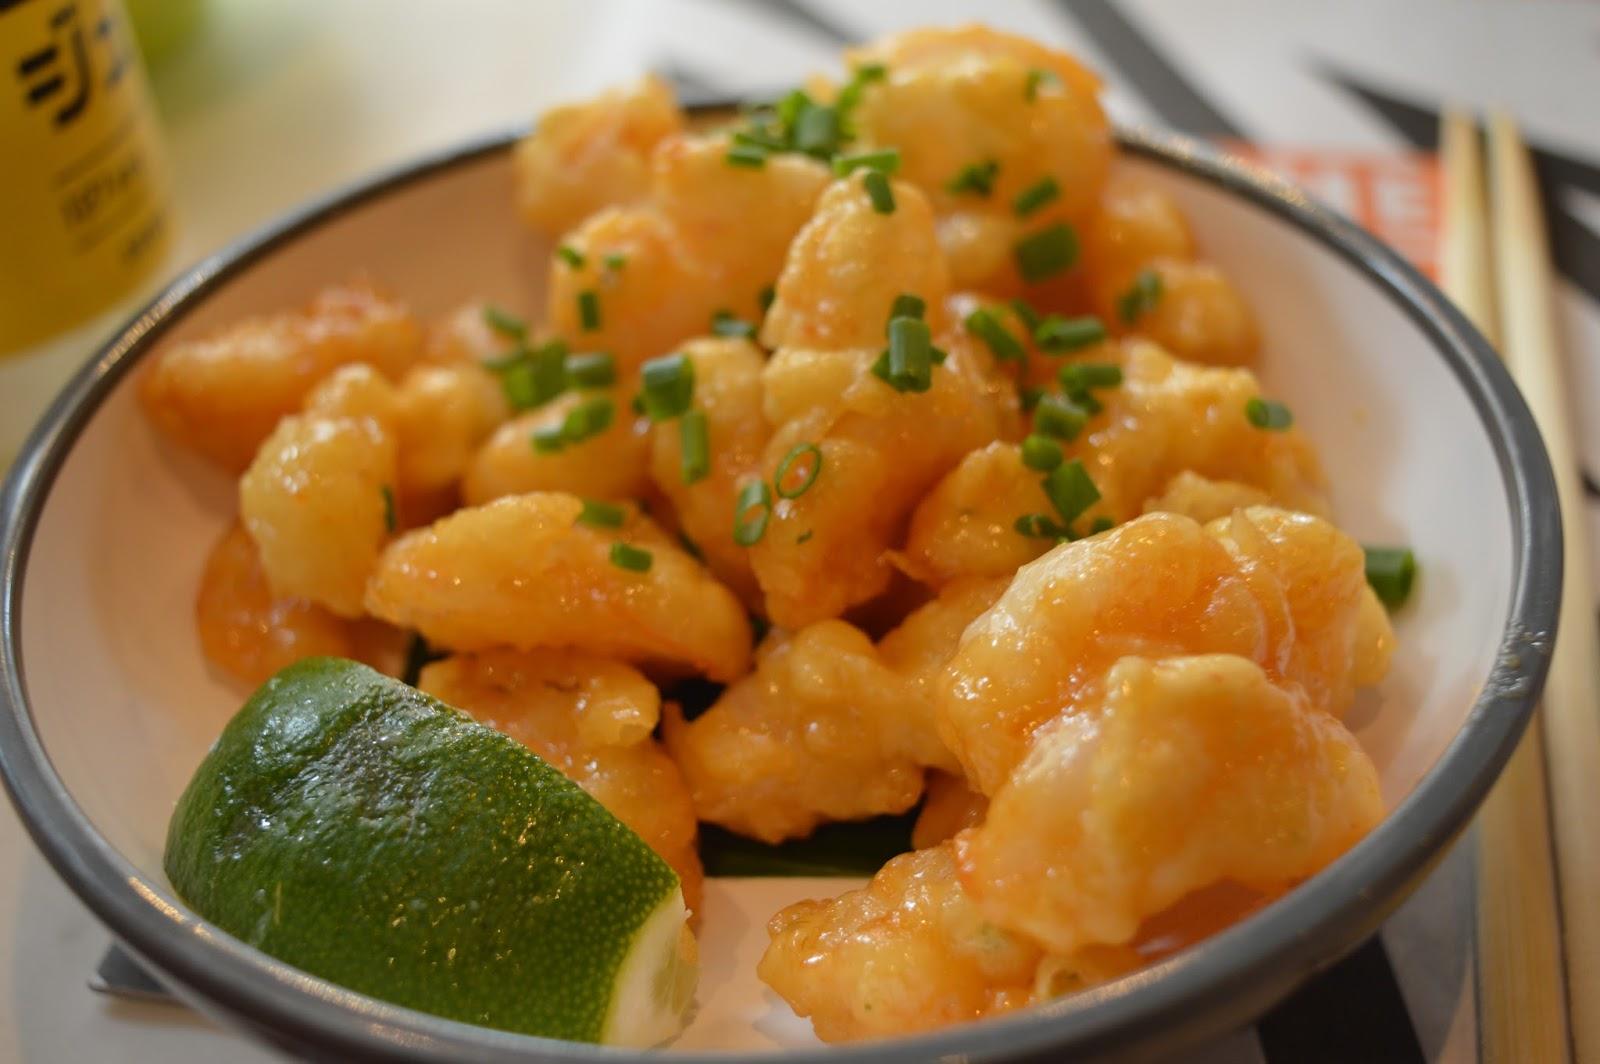 YO! Sushi Newcastle Grainger Street - Kids Menu Review - popcorn shrimp tempura